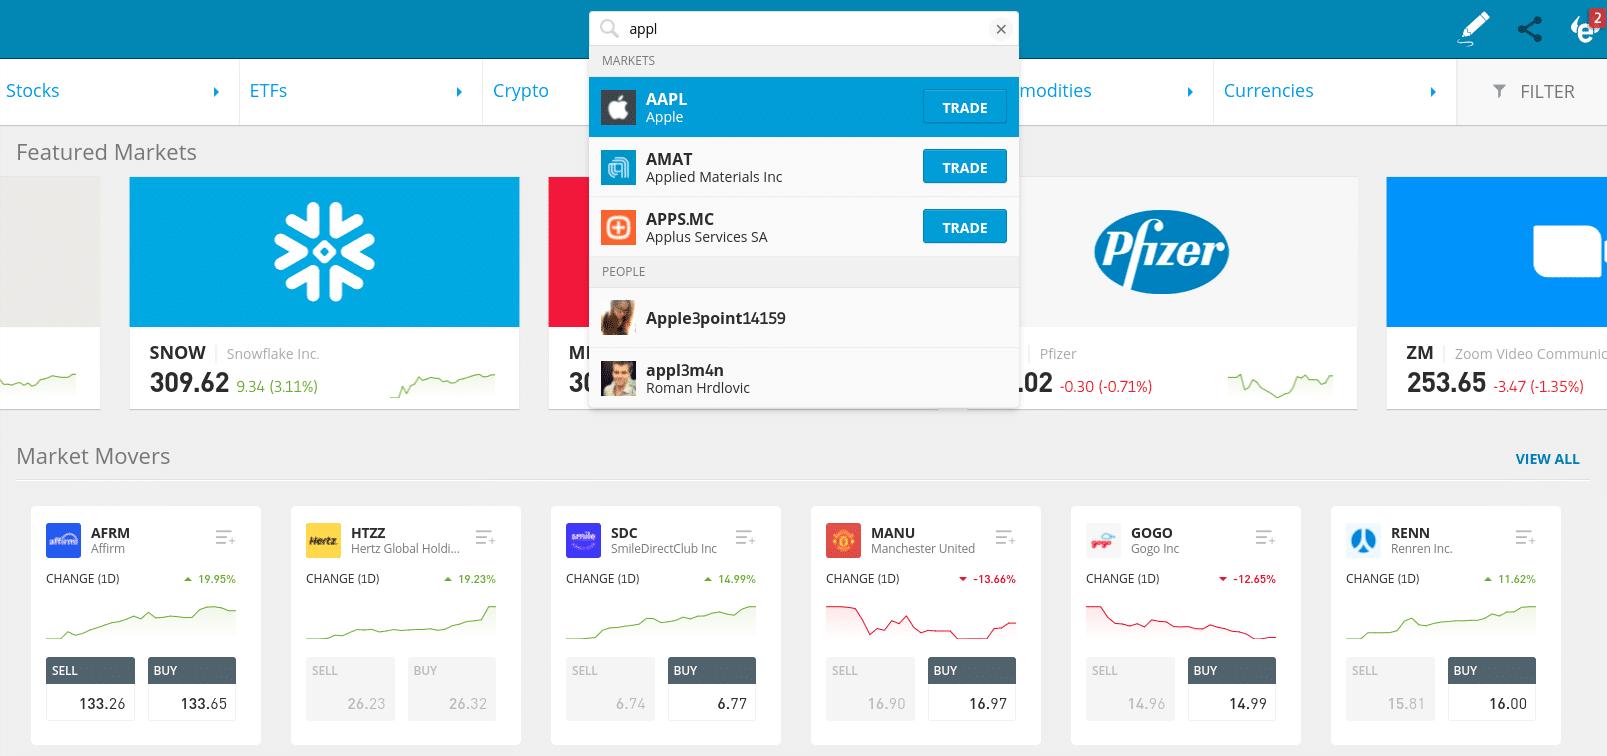 eToro invest in Apple search